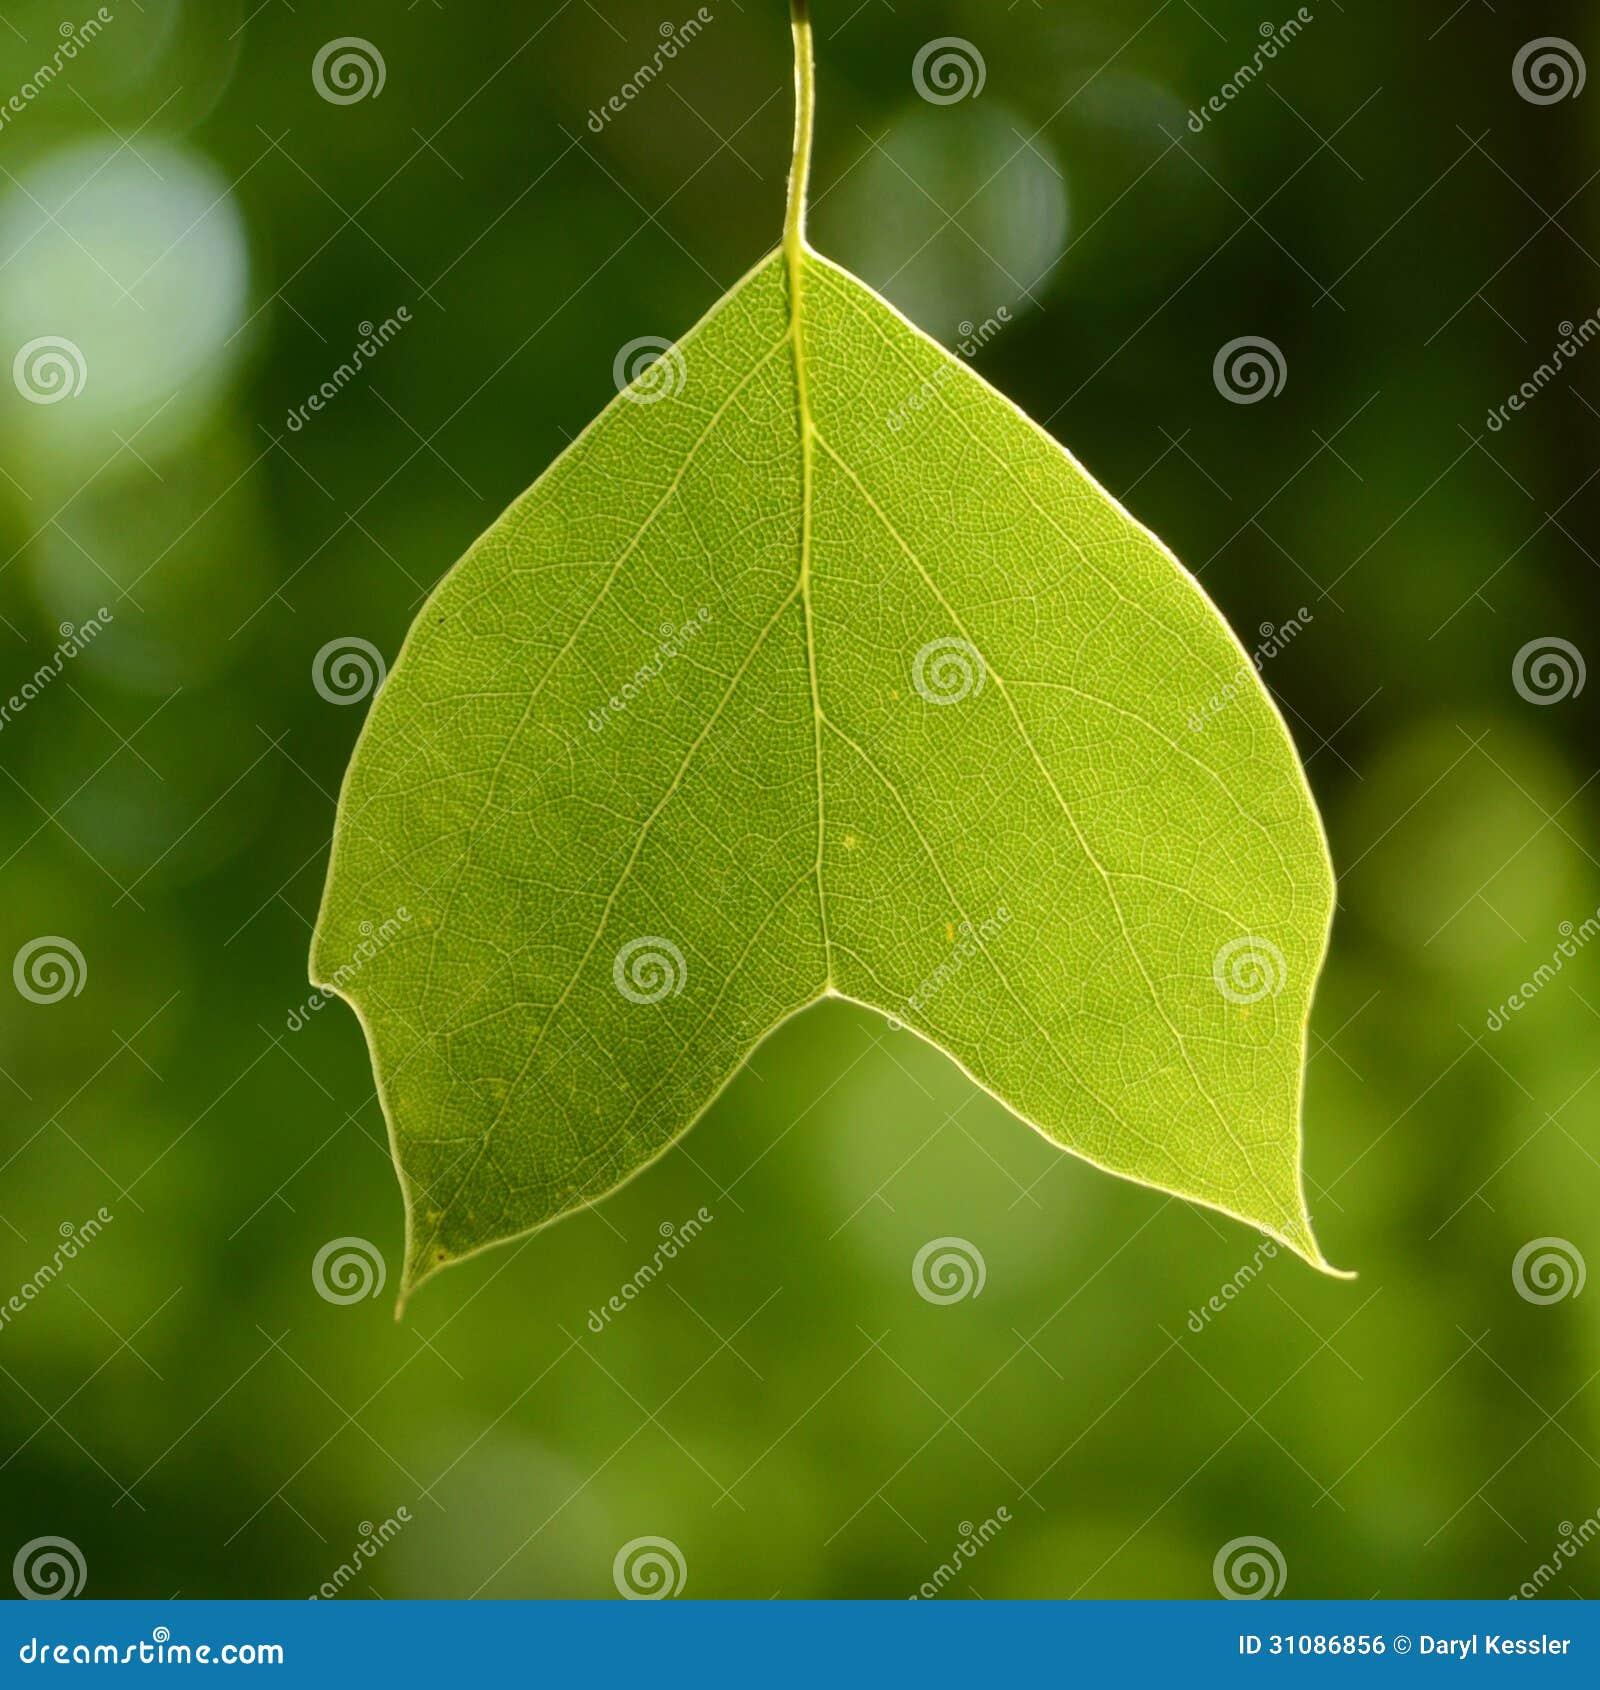 Beautiful backlit green tree leaf with an unusual shape